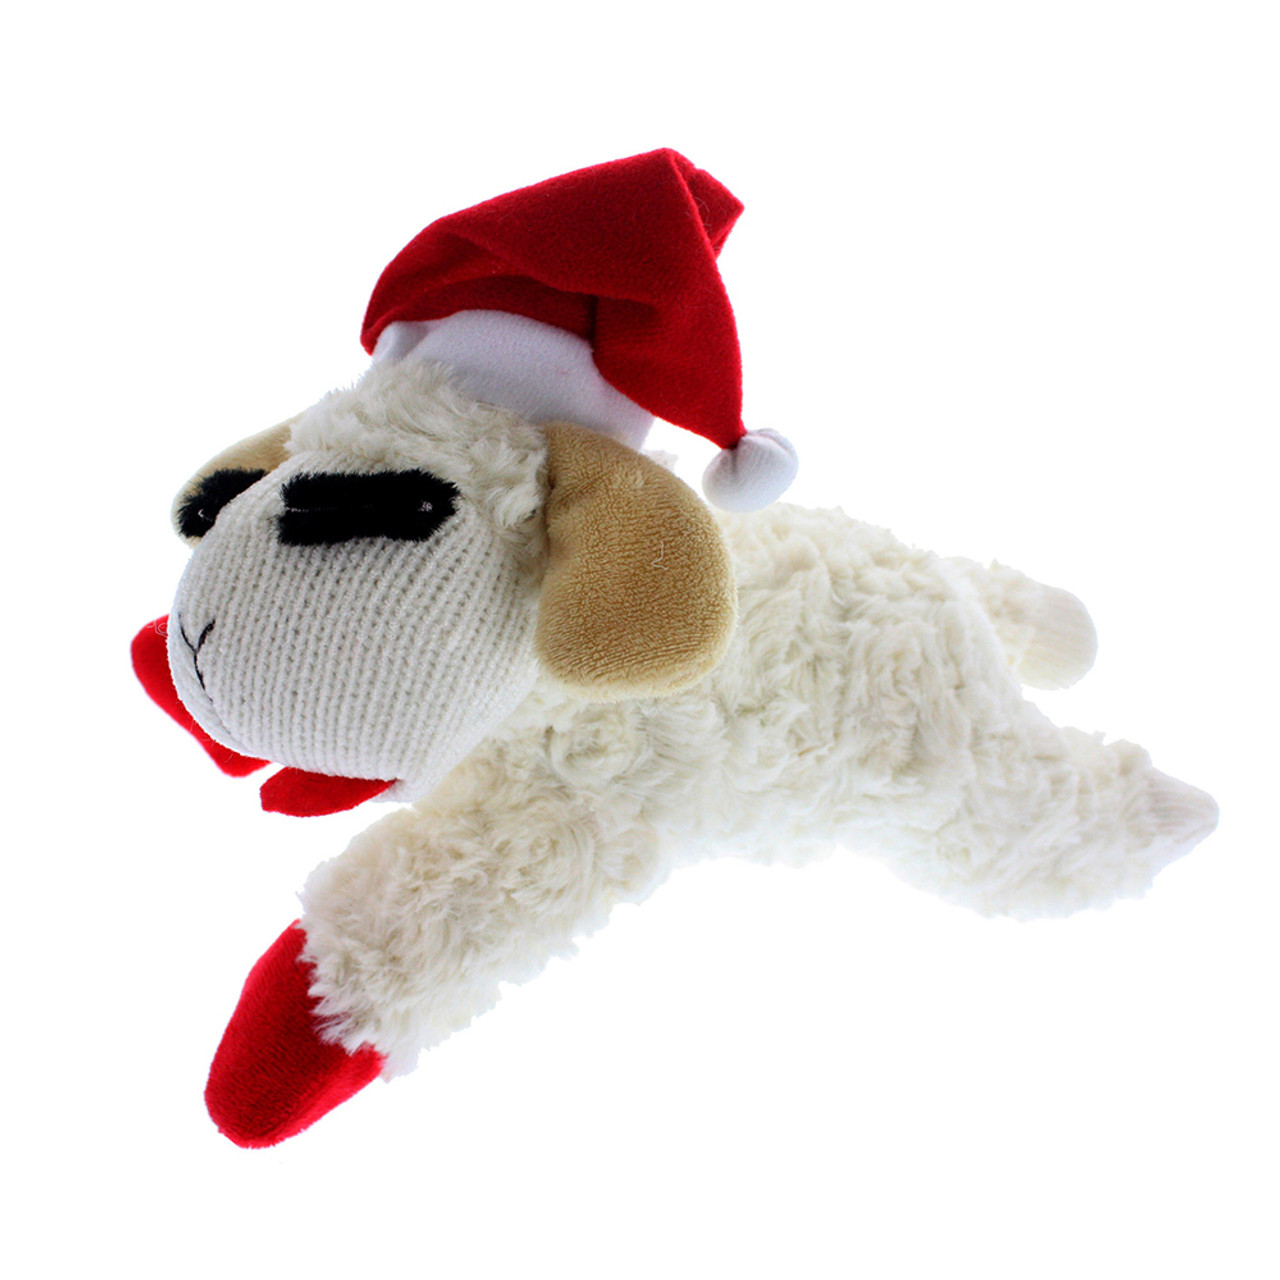 Multipet Mini Holiday Lamb Chop with Santa Hat Plush Dog Toy